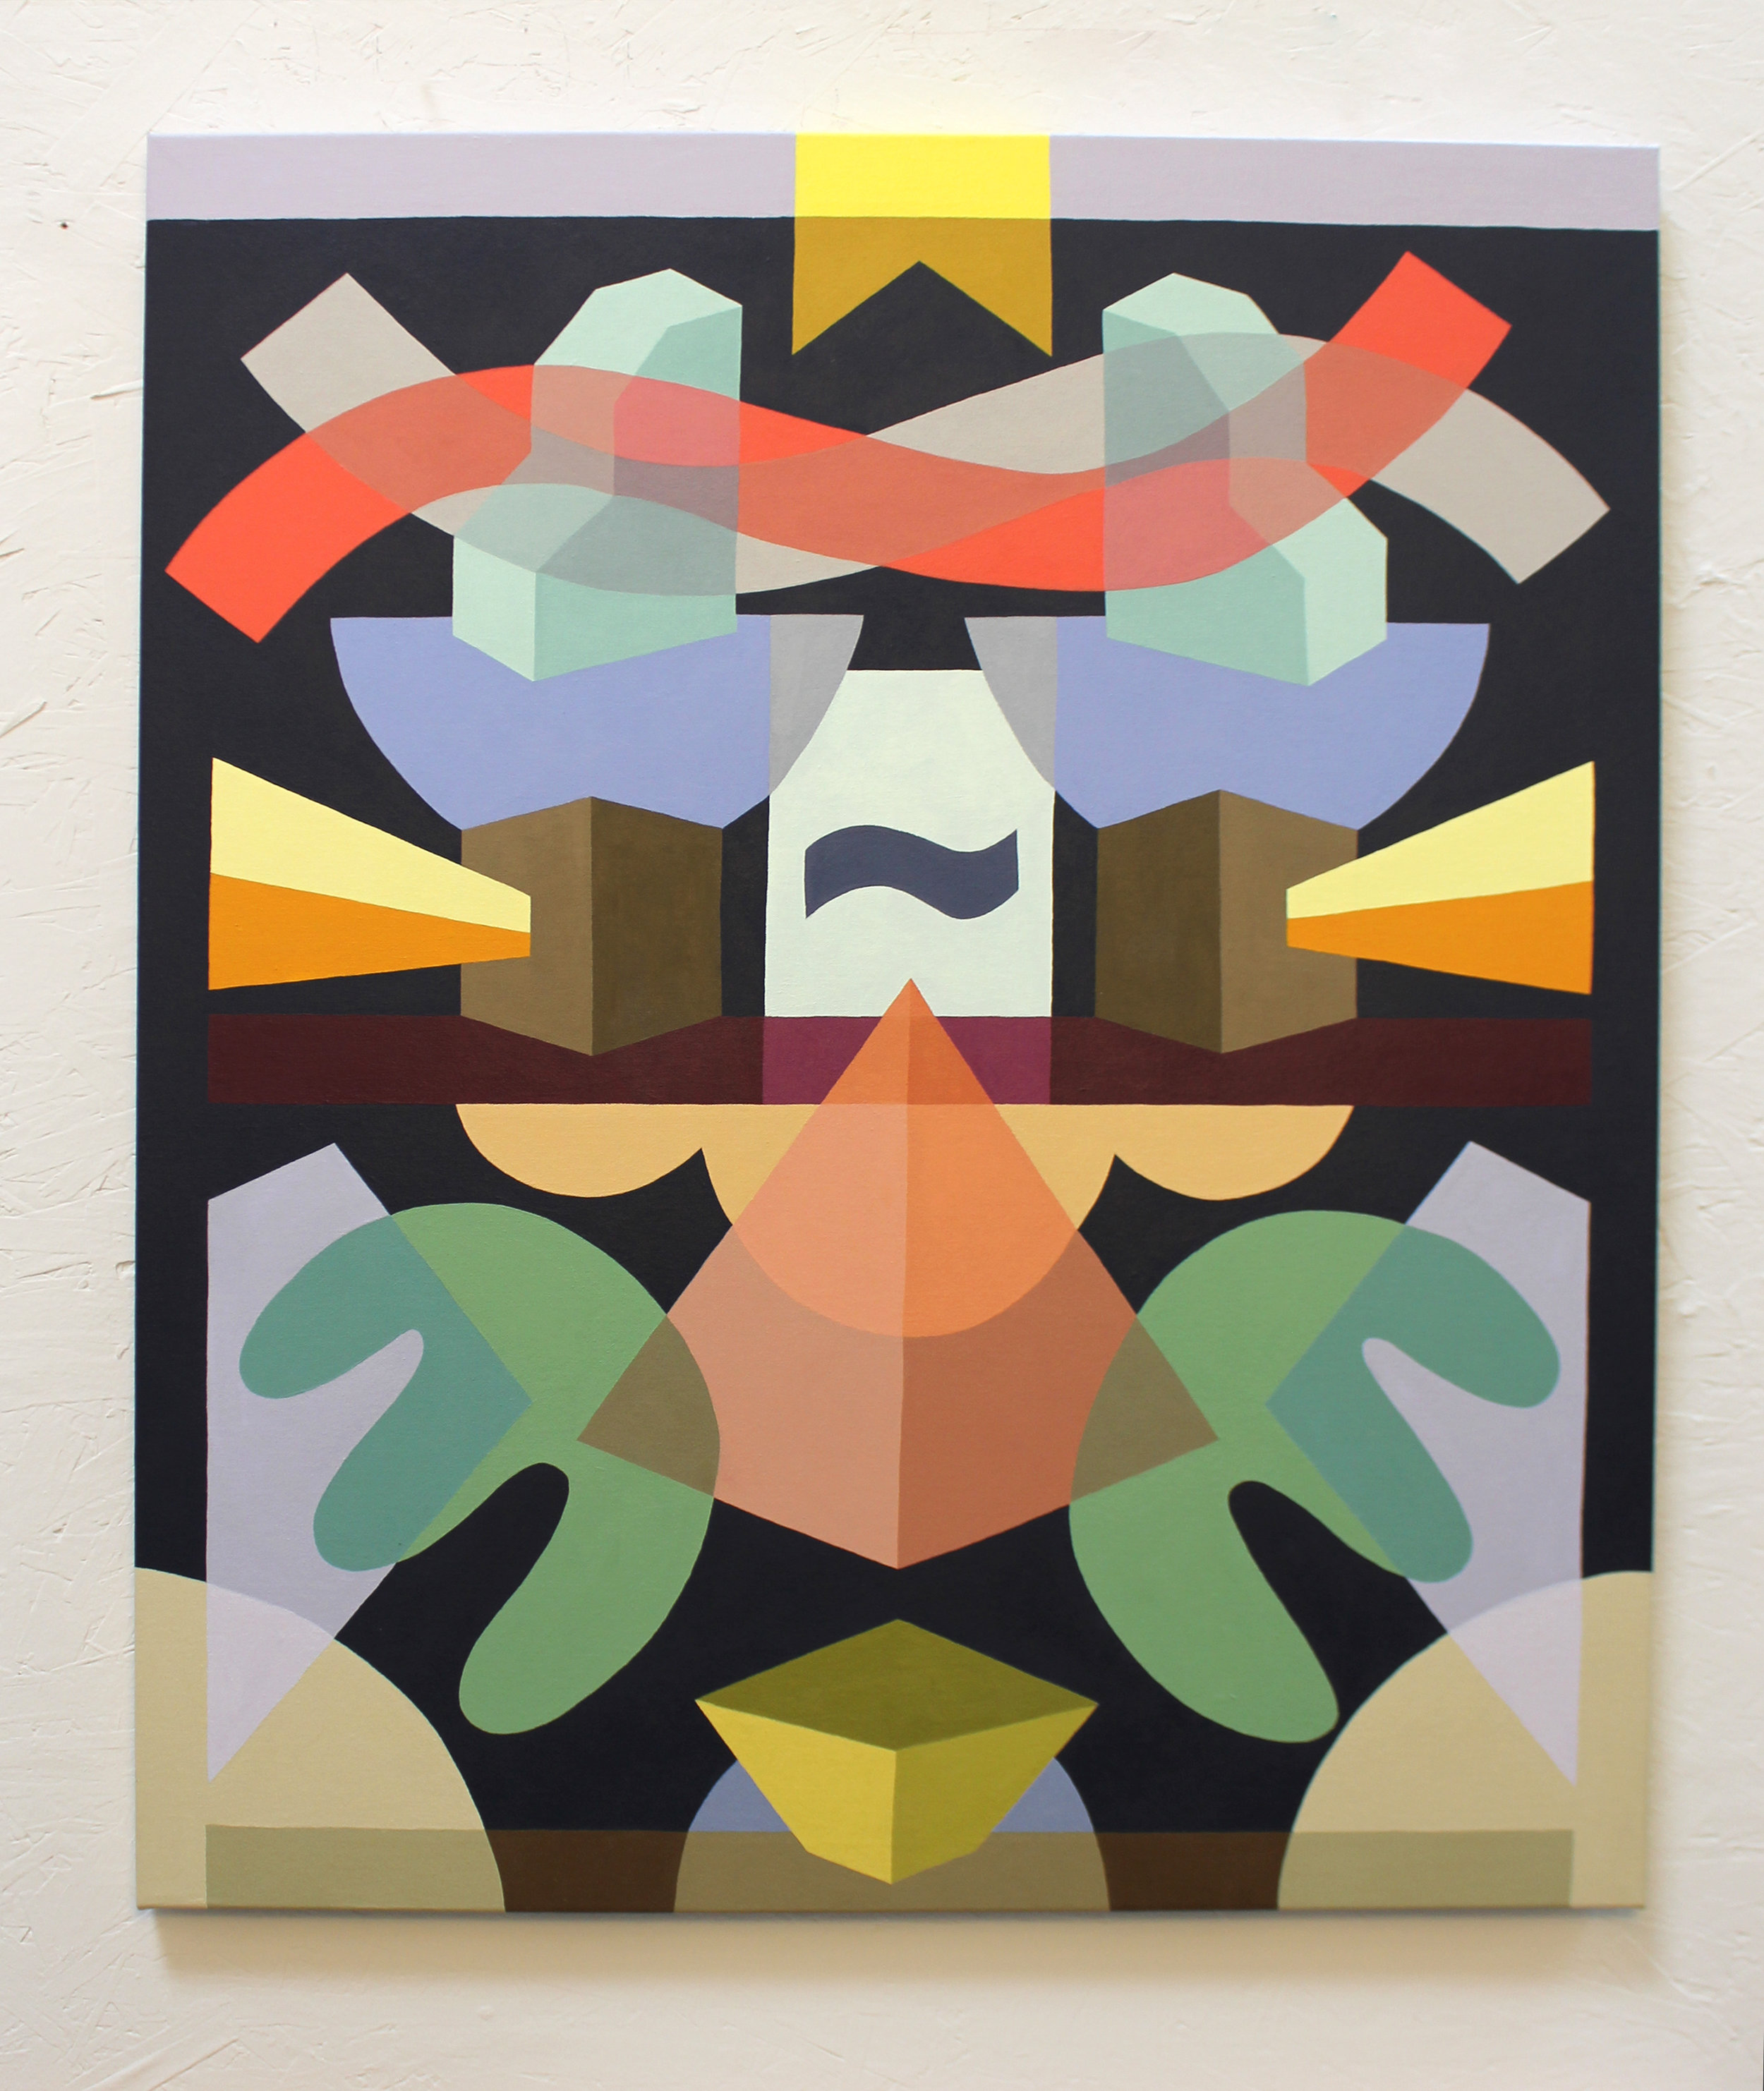 Opposite Symmetry #1  Acrylic on canvas. 2018